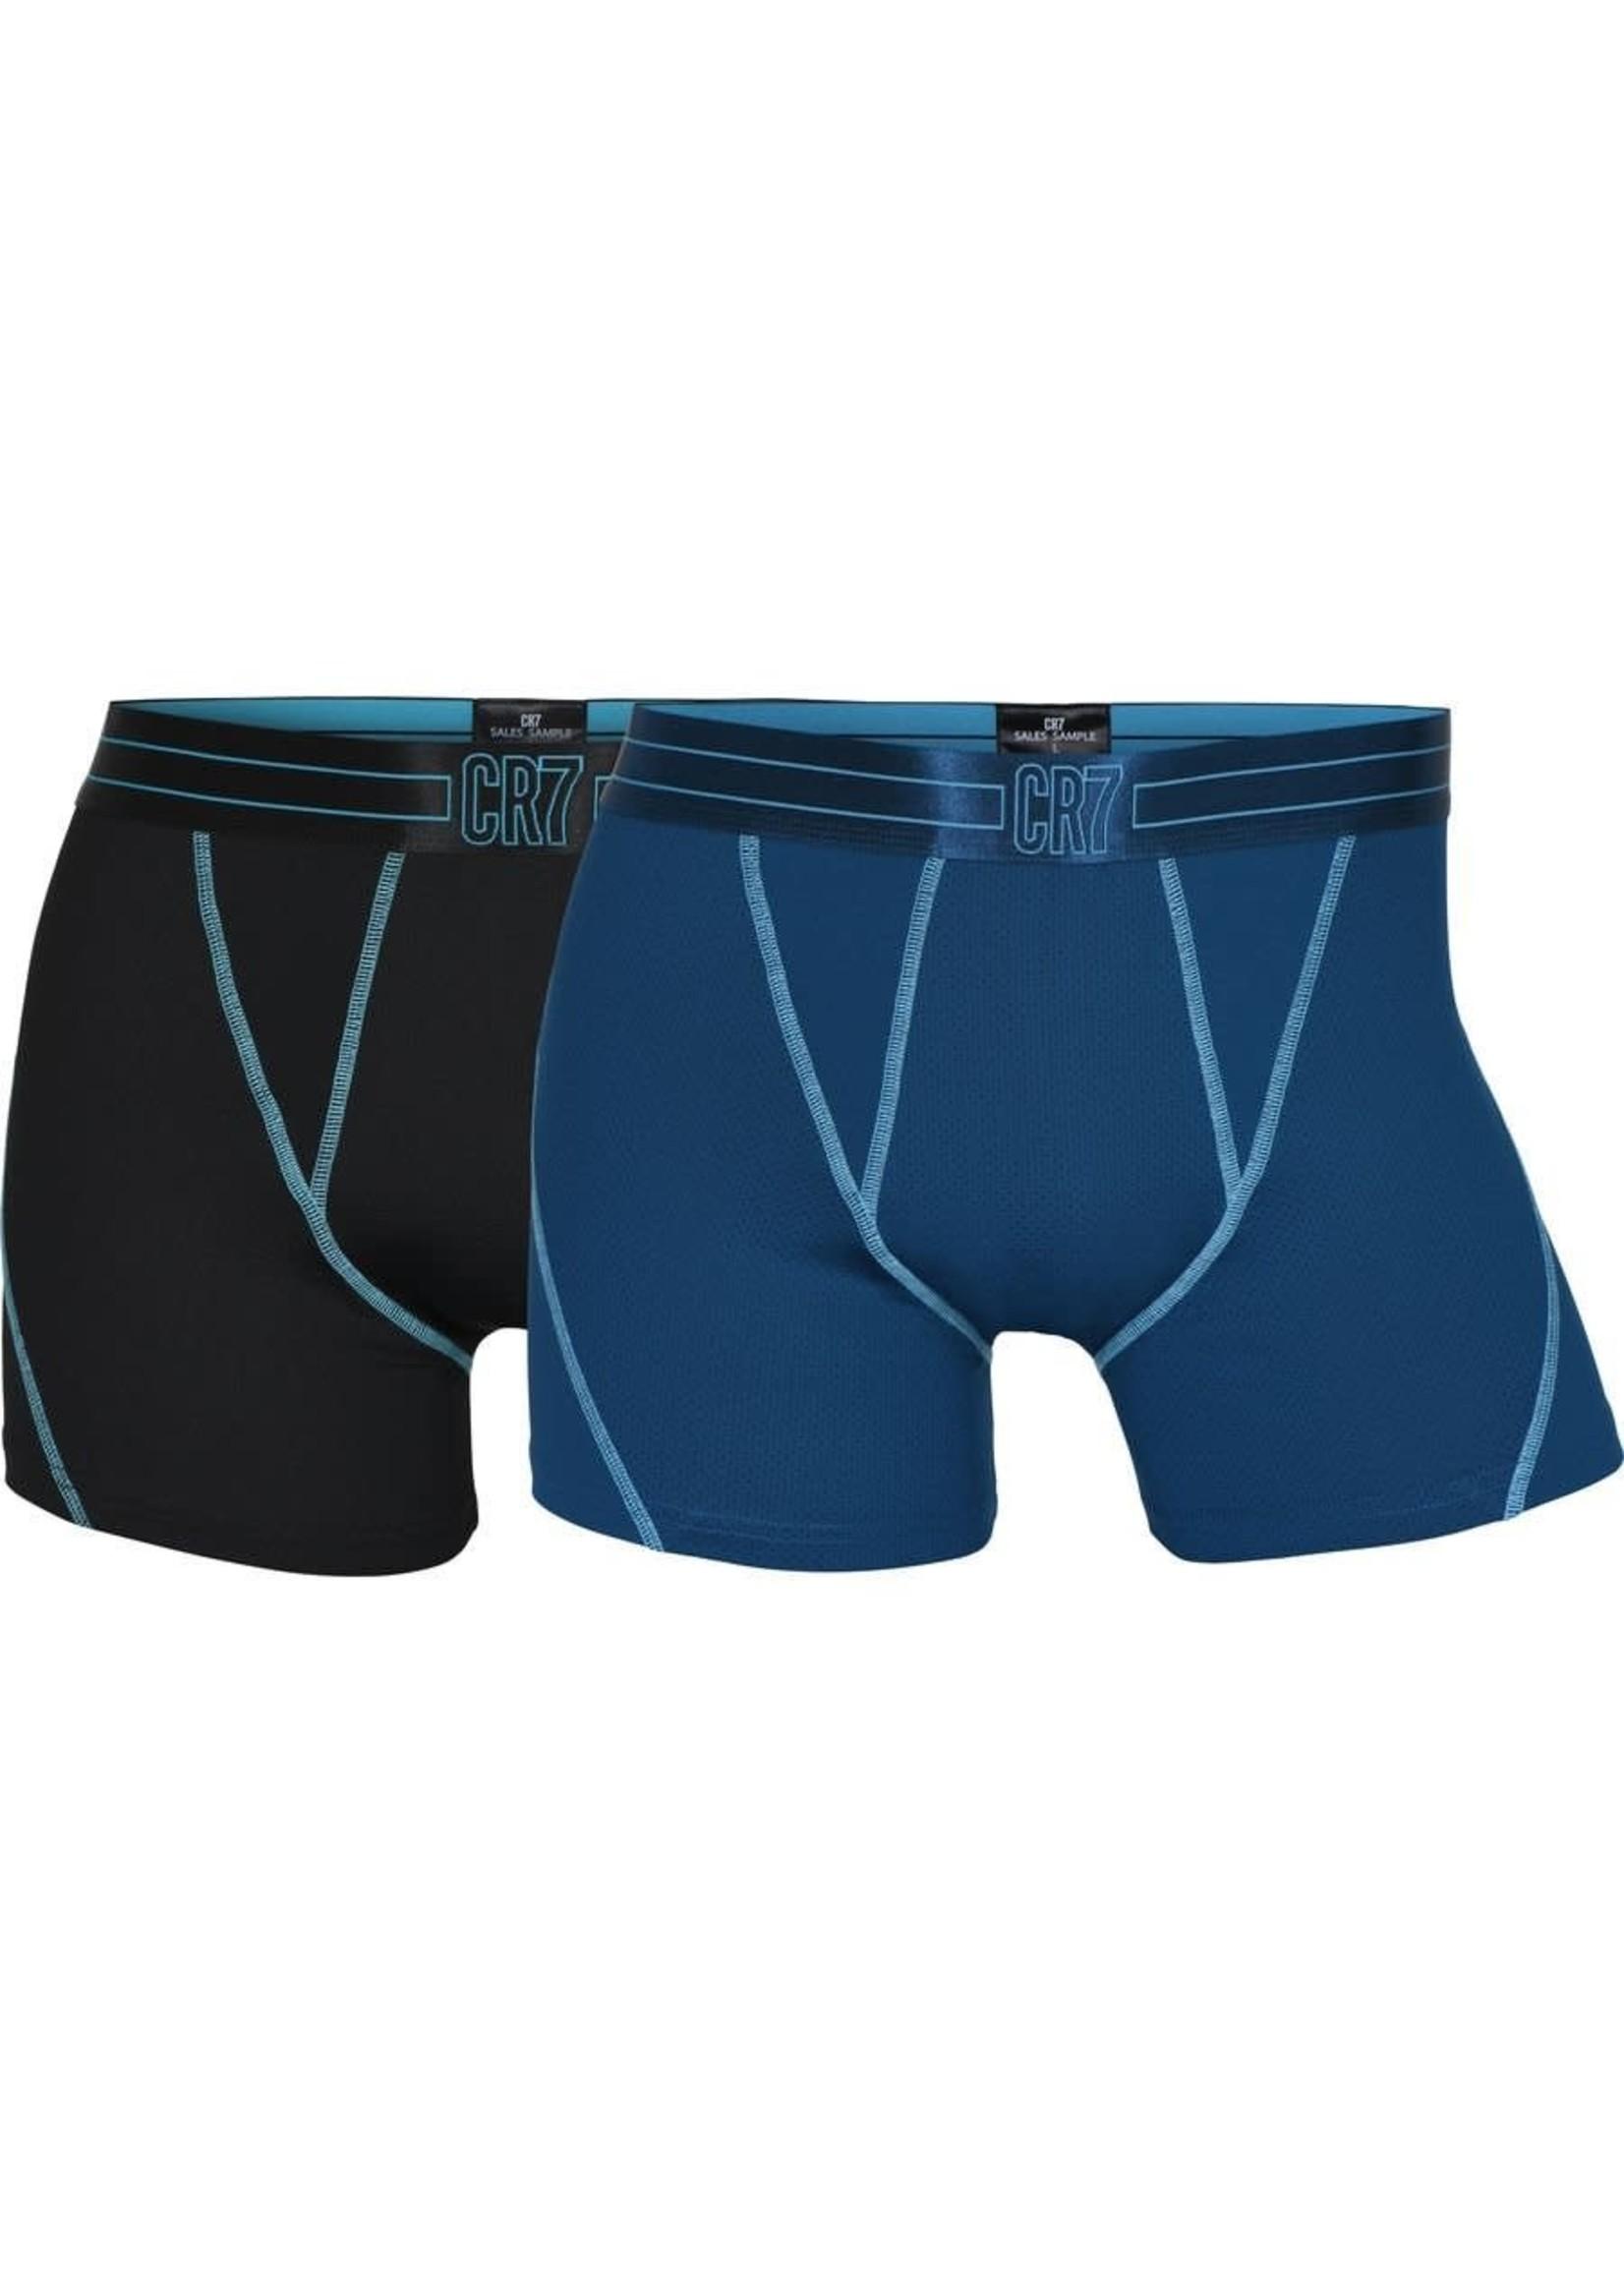 CR7 Boxer Underwear 2-Pack - Black/Blue Adult